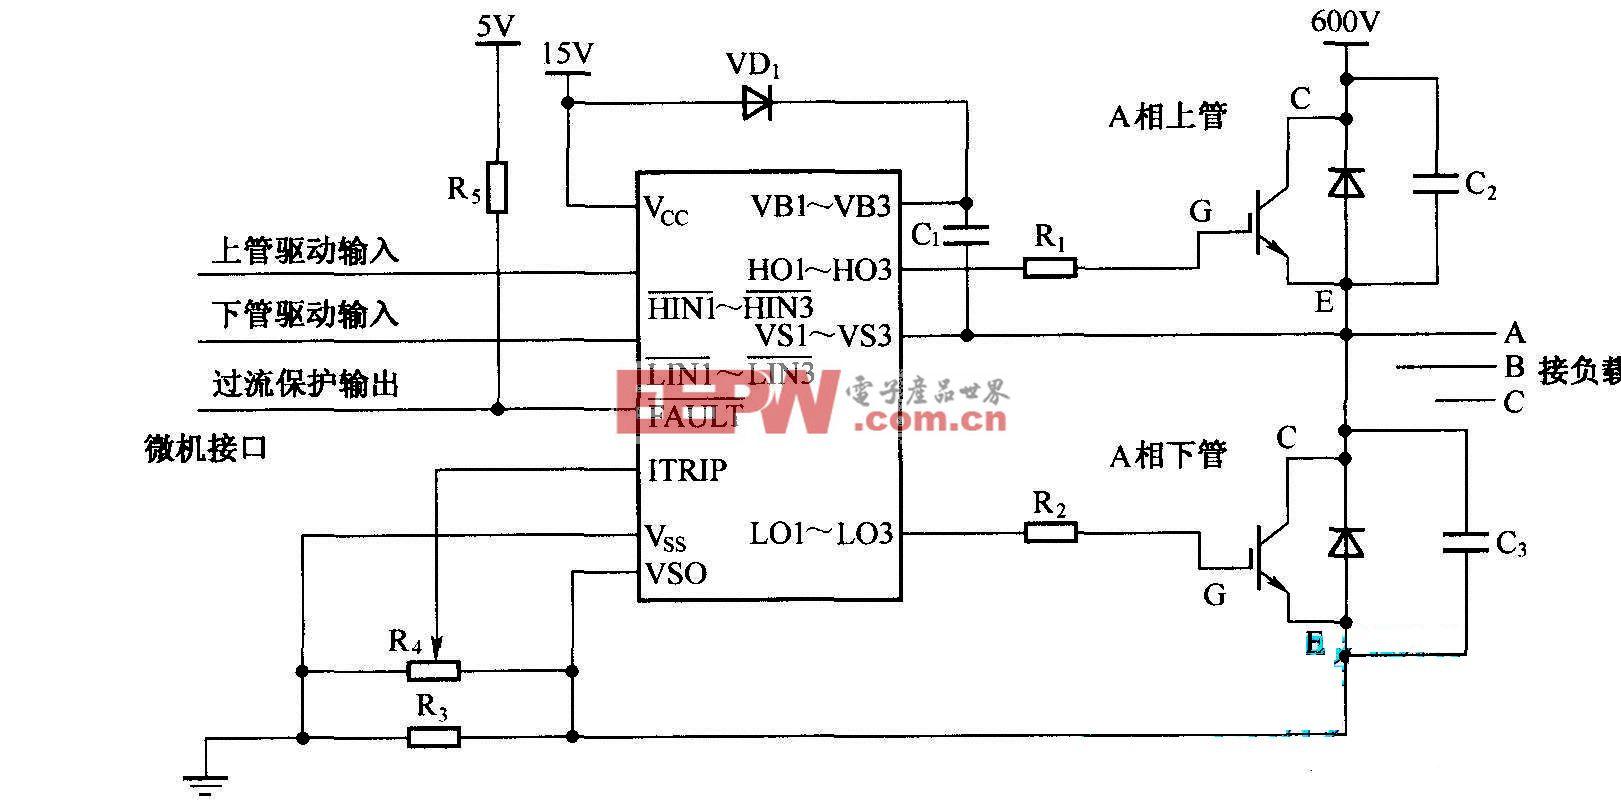 IR2130与功率管的连接方式